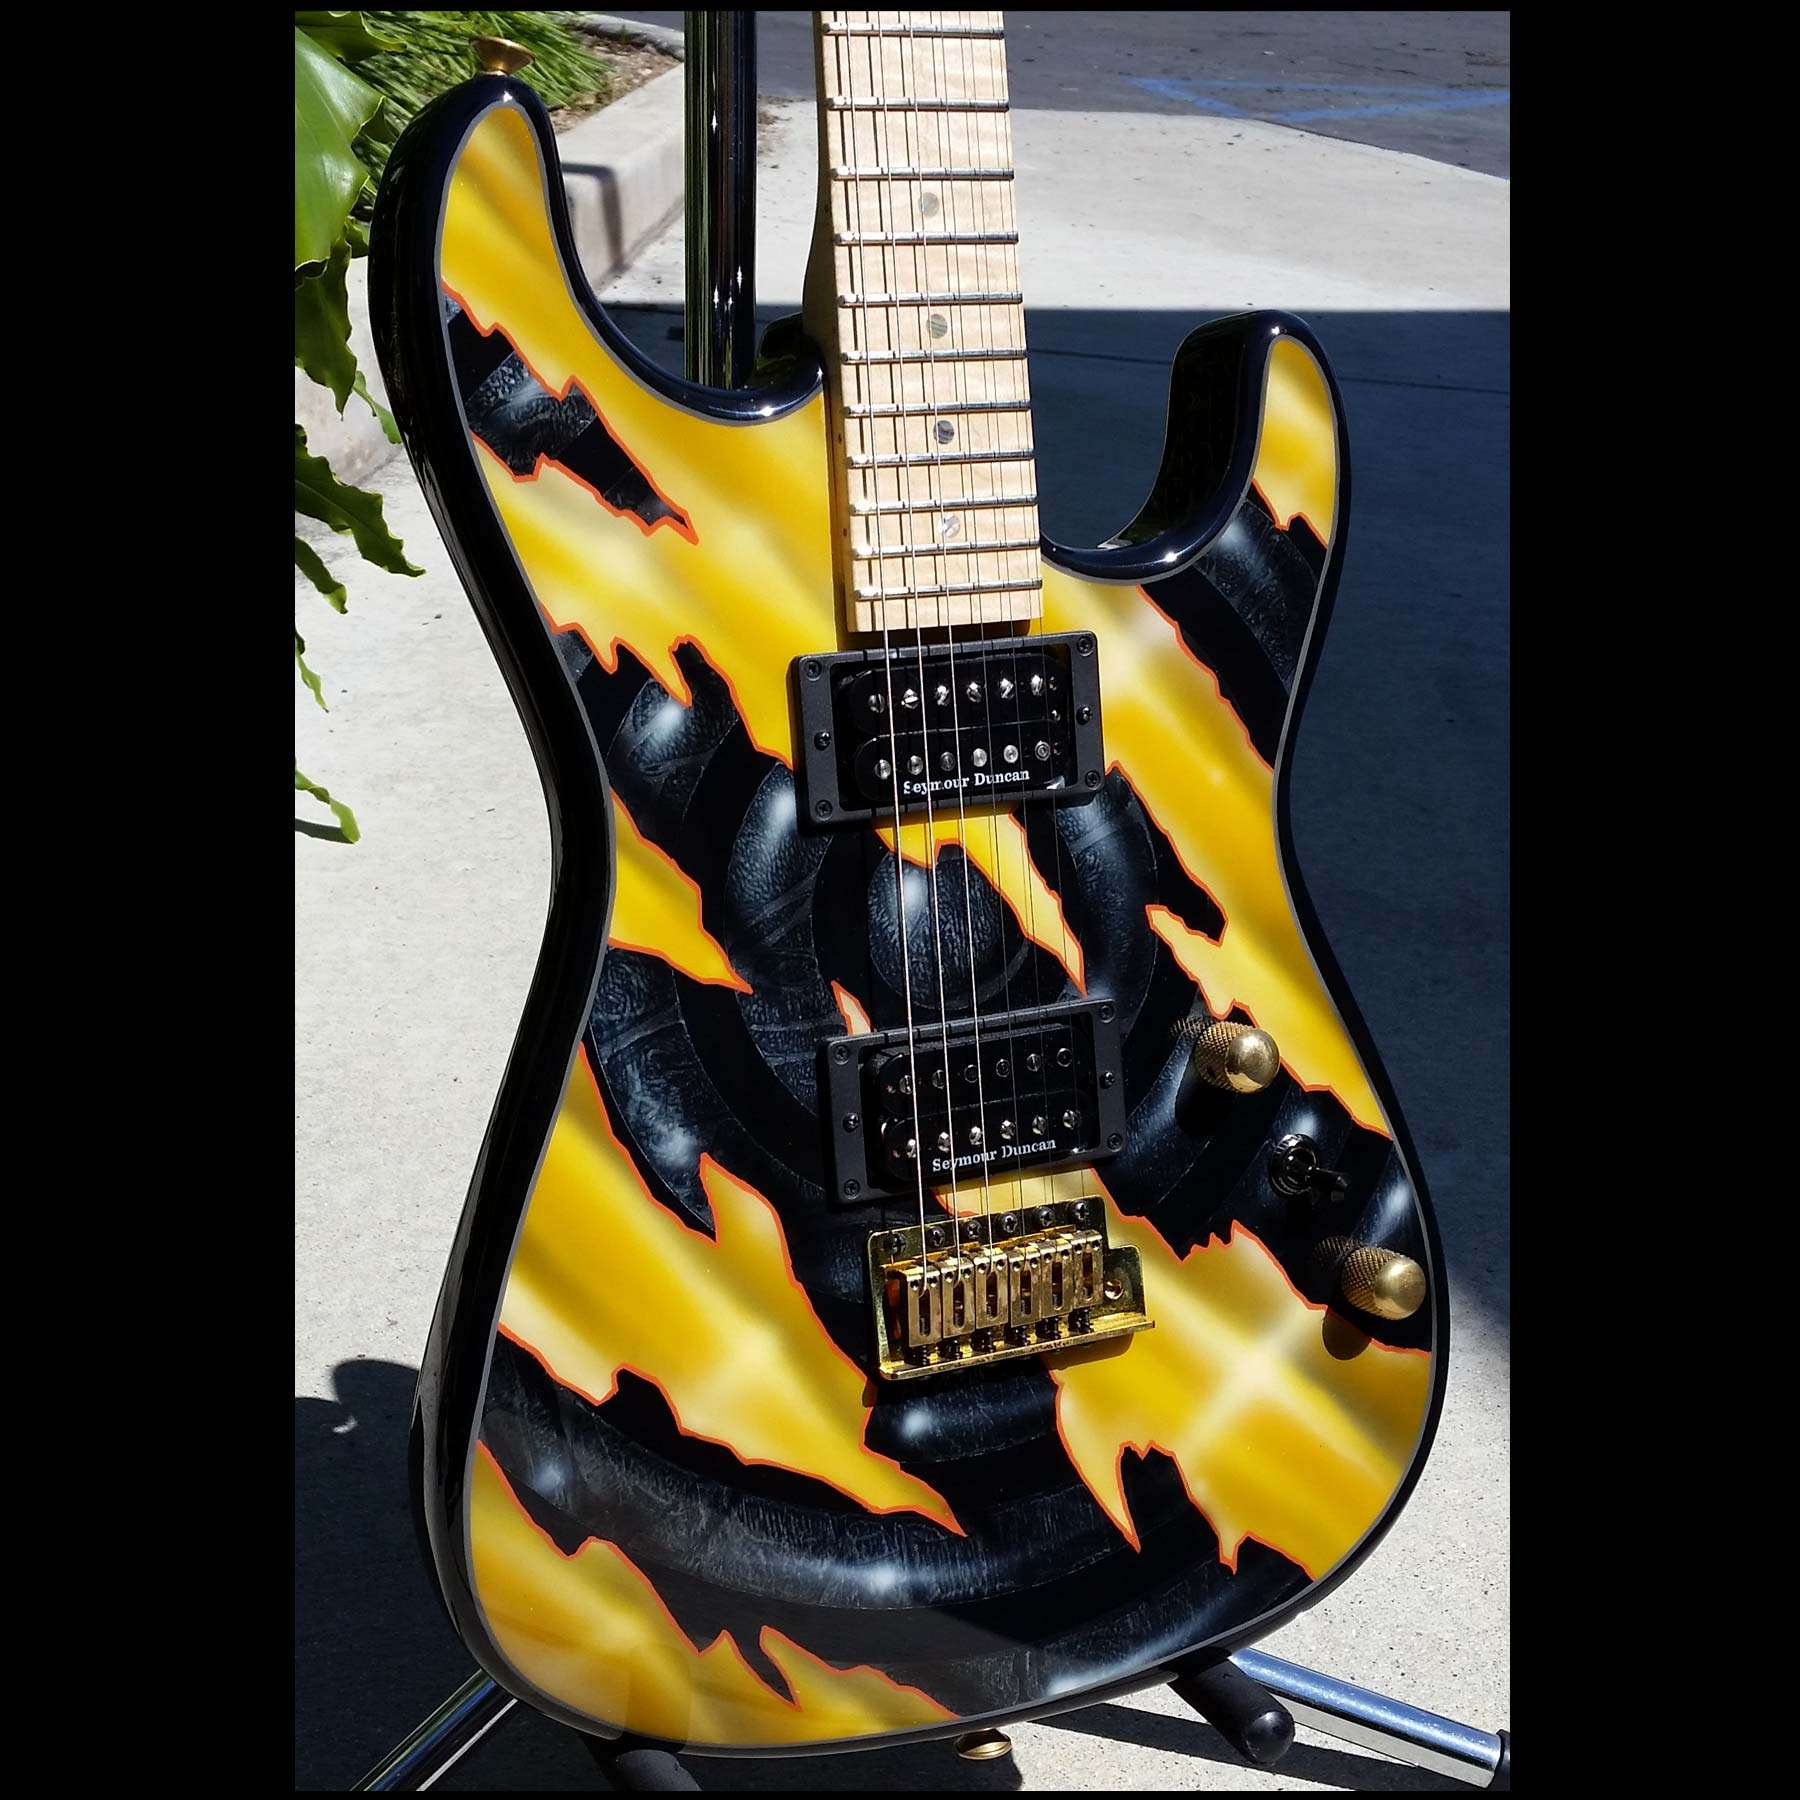 charvel custom shop san dimas with ernie pedregon custom paint wild west guitars. Black Bedroom Furniture Sets. Home Design Ideas